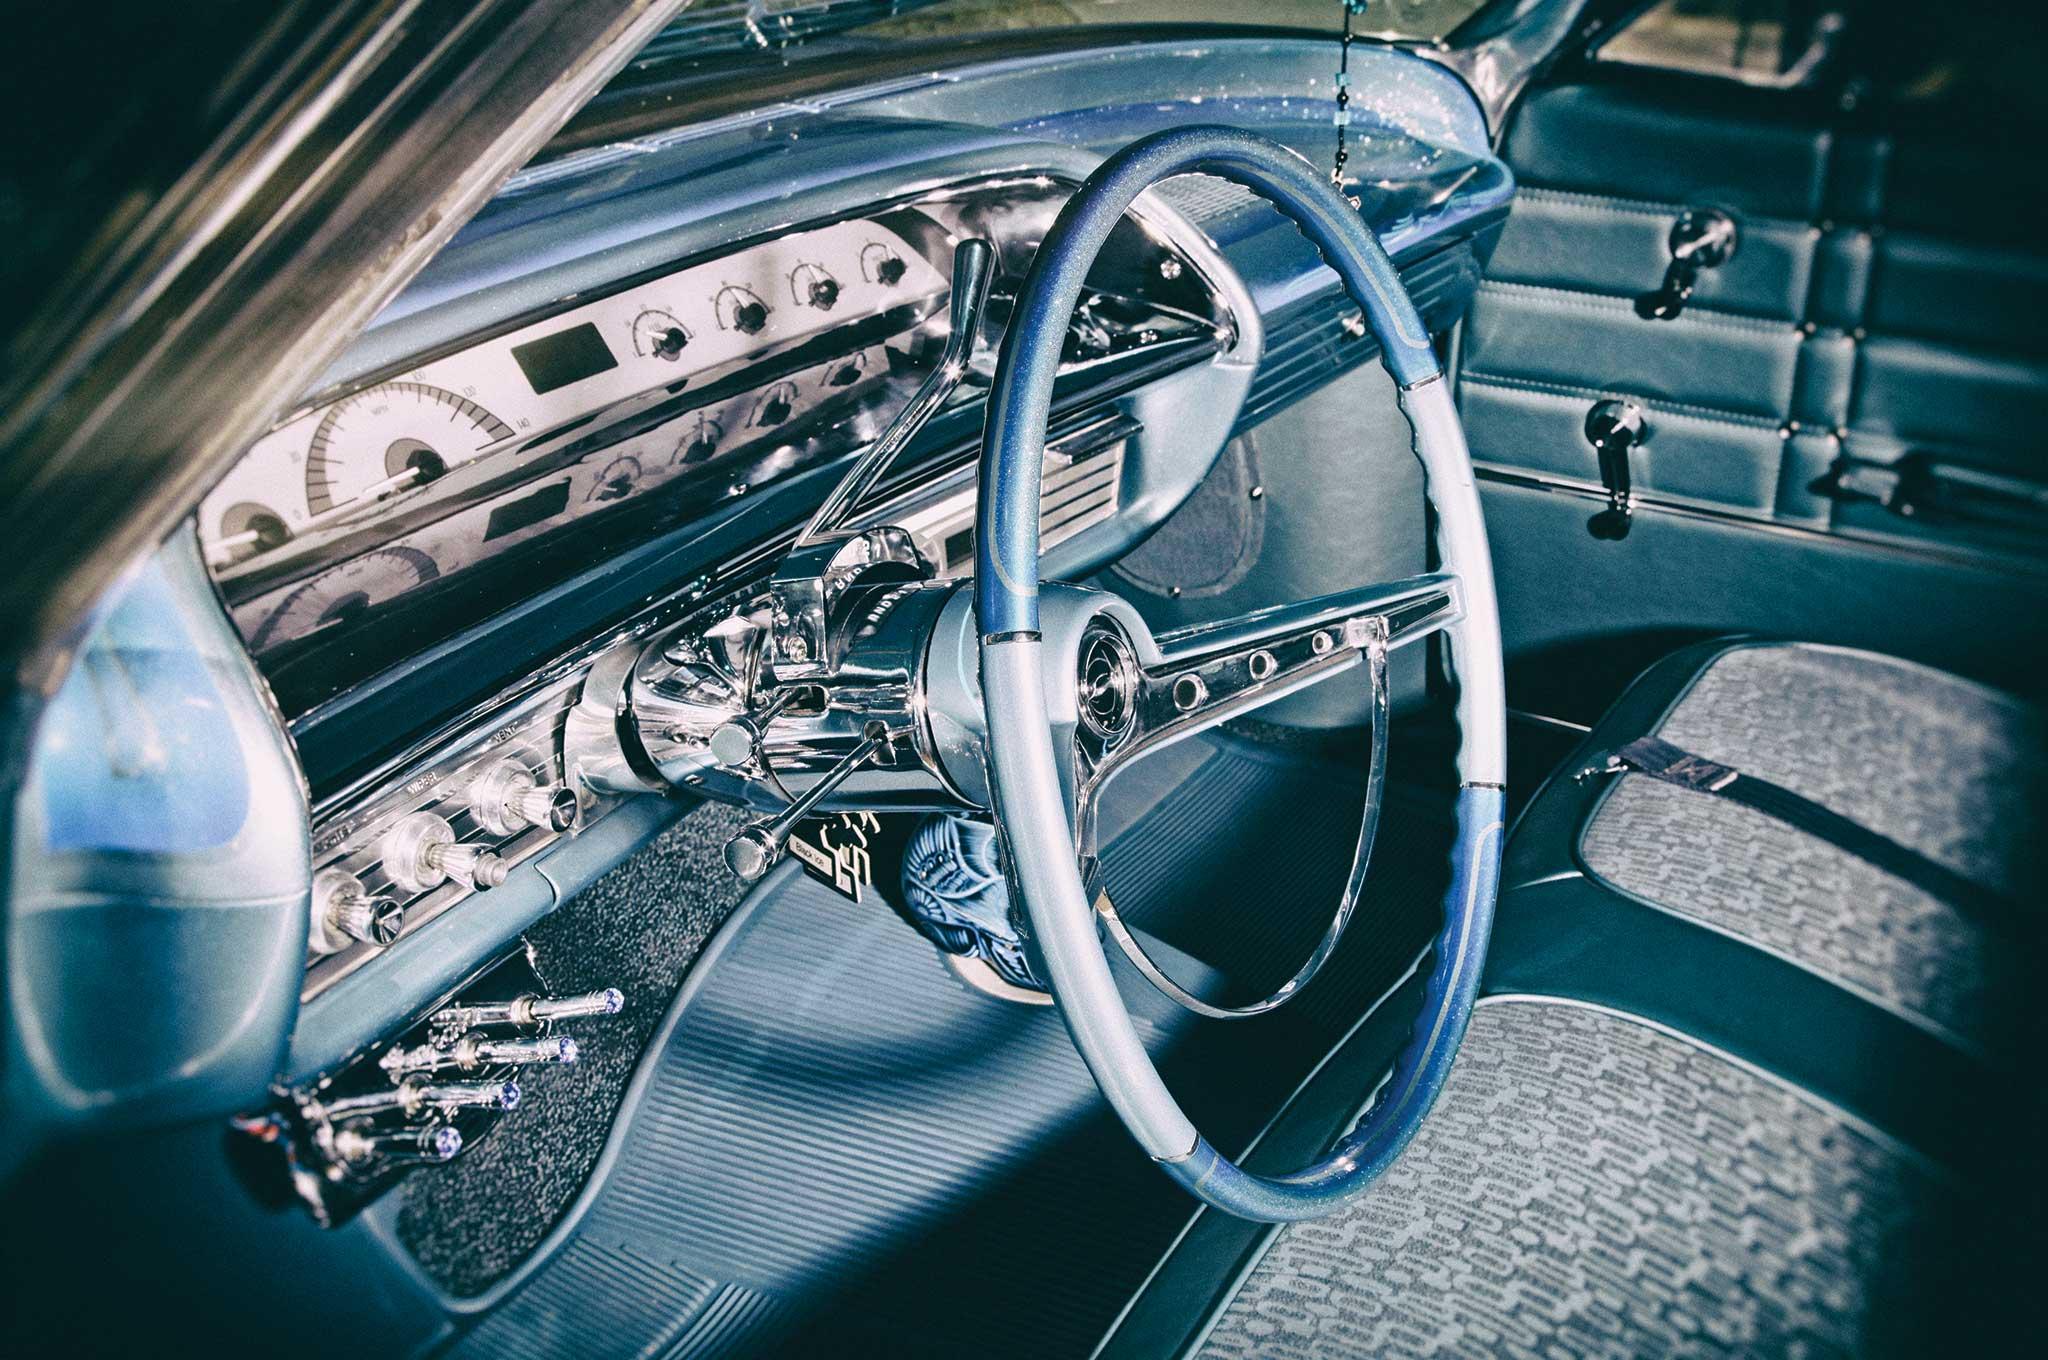 1963 Chevrolet Impala El Six Lowrider